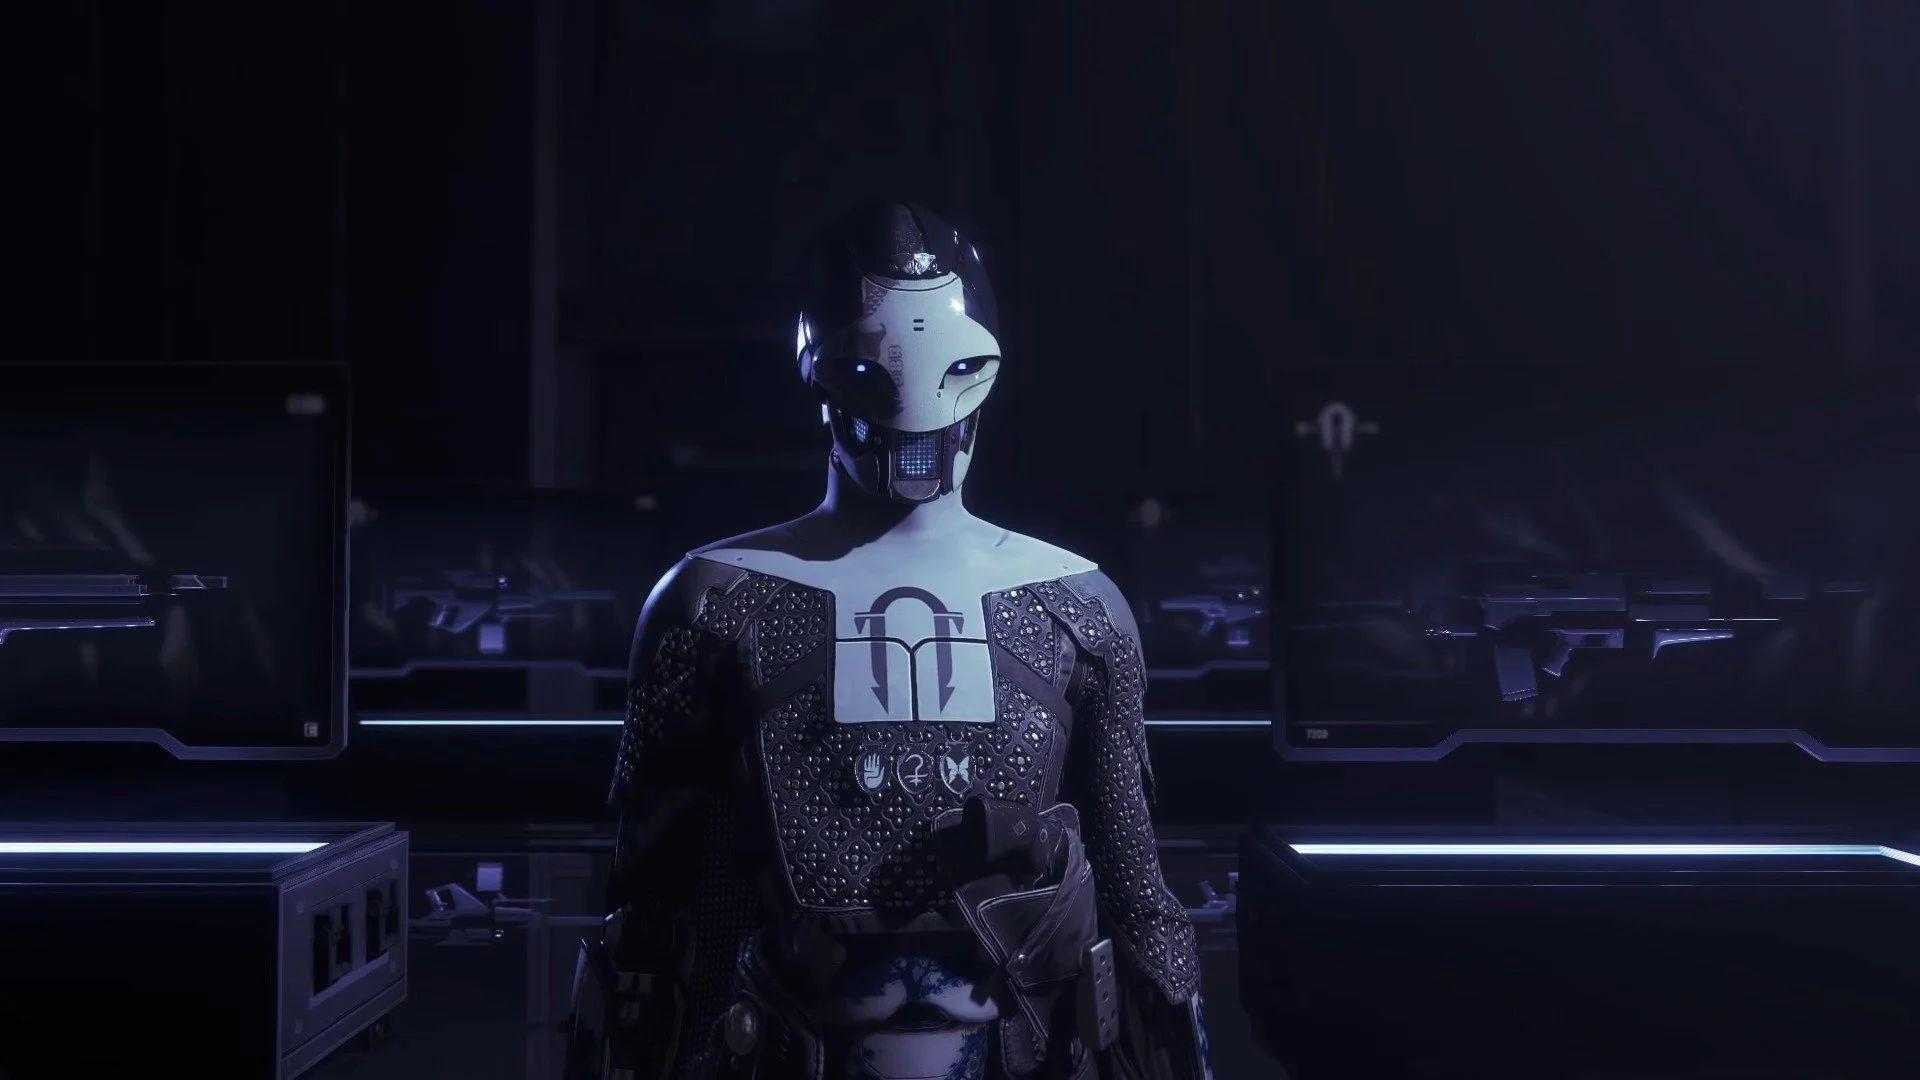 Destiny 2 - Ada-1